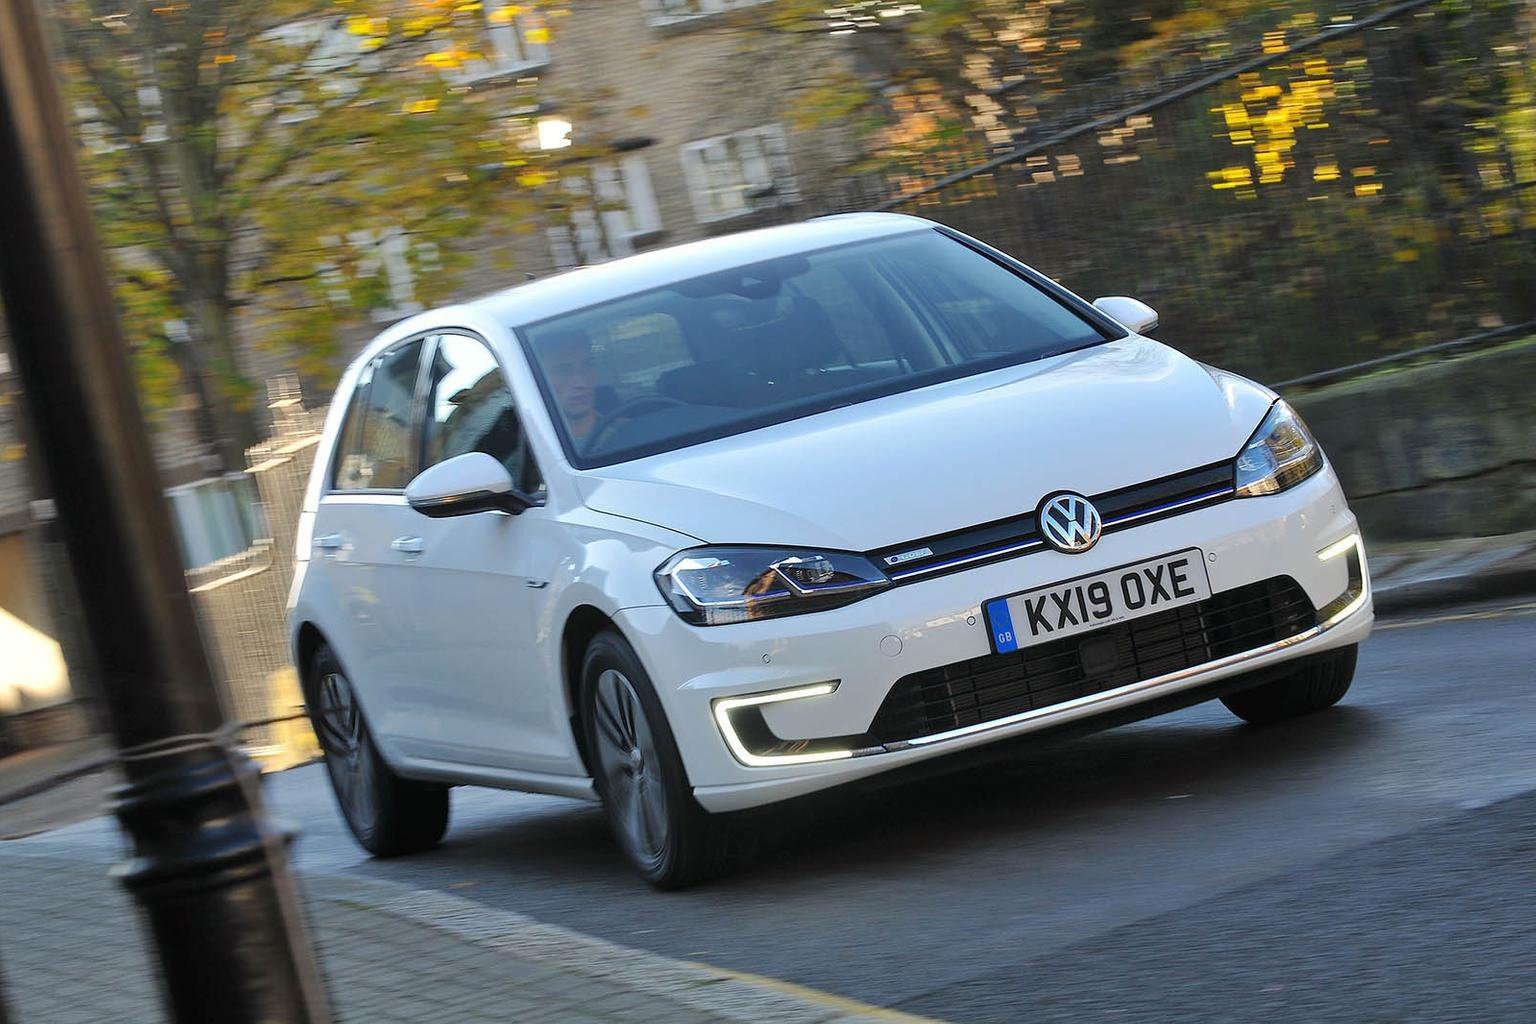 Volkswagen e-Golf front - 19 plate